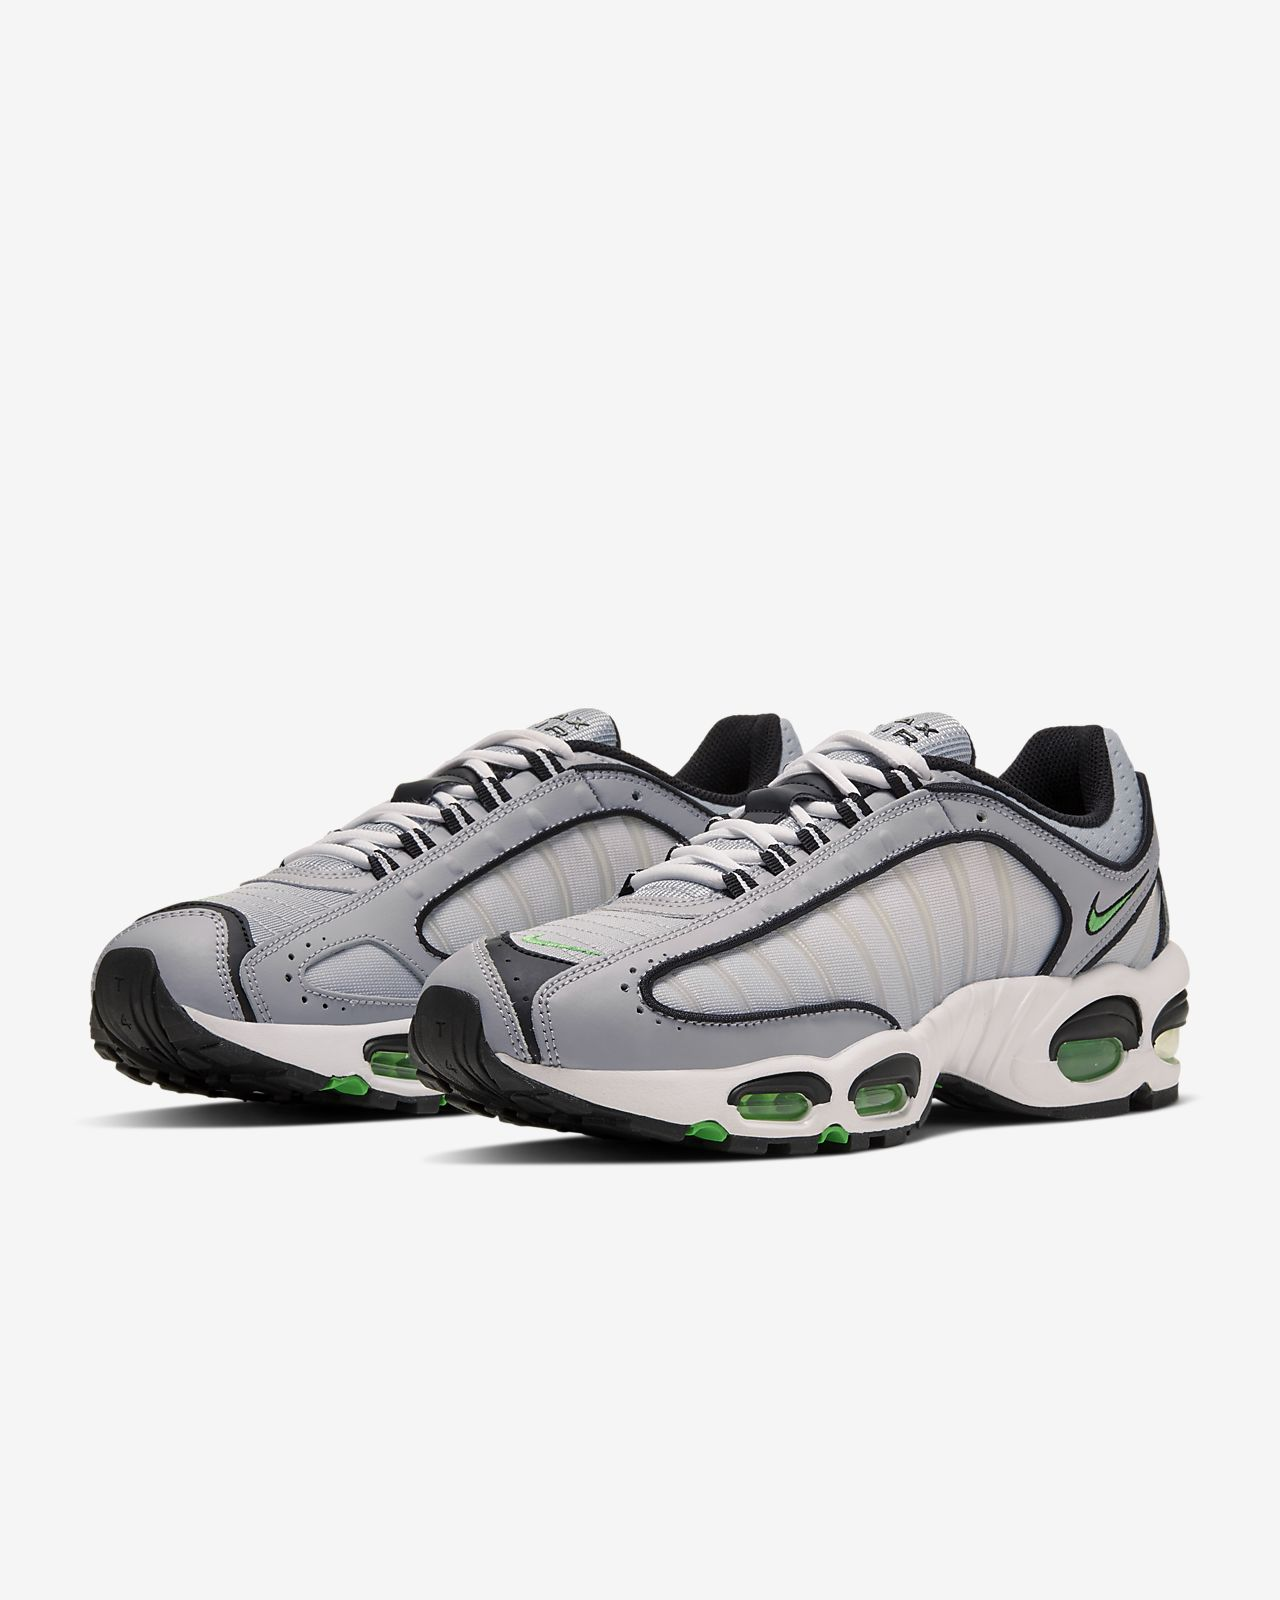 Nike Air Max Tailwind IV Men's Shoe. Nike NL